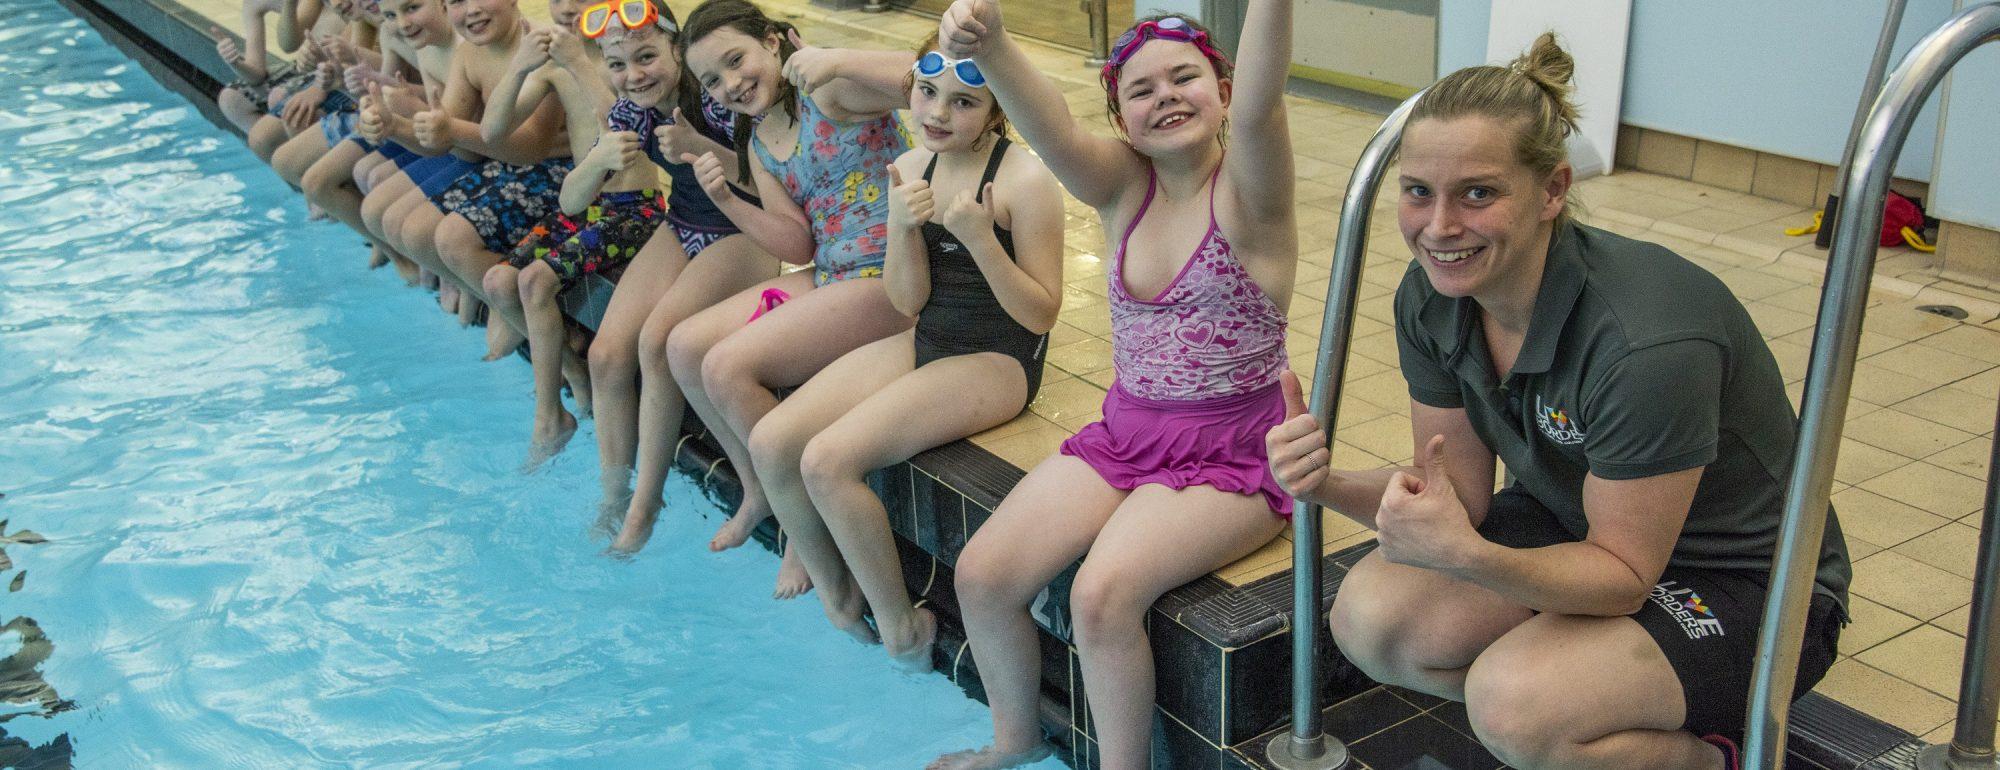 Live BordersSchool swimming classes.